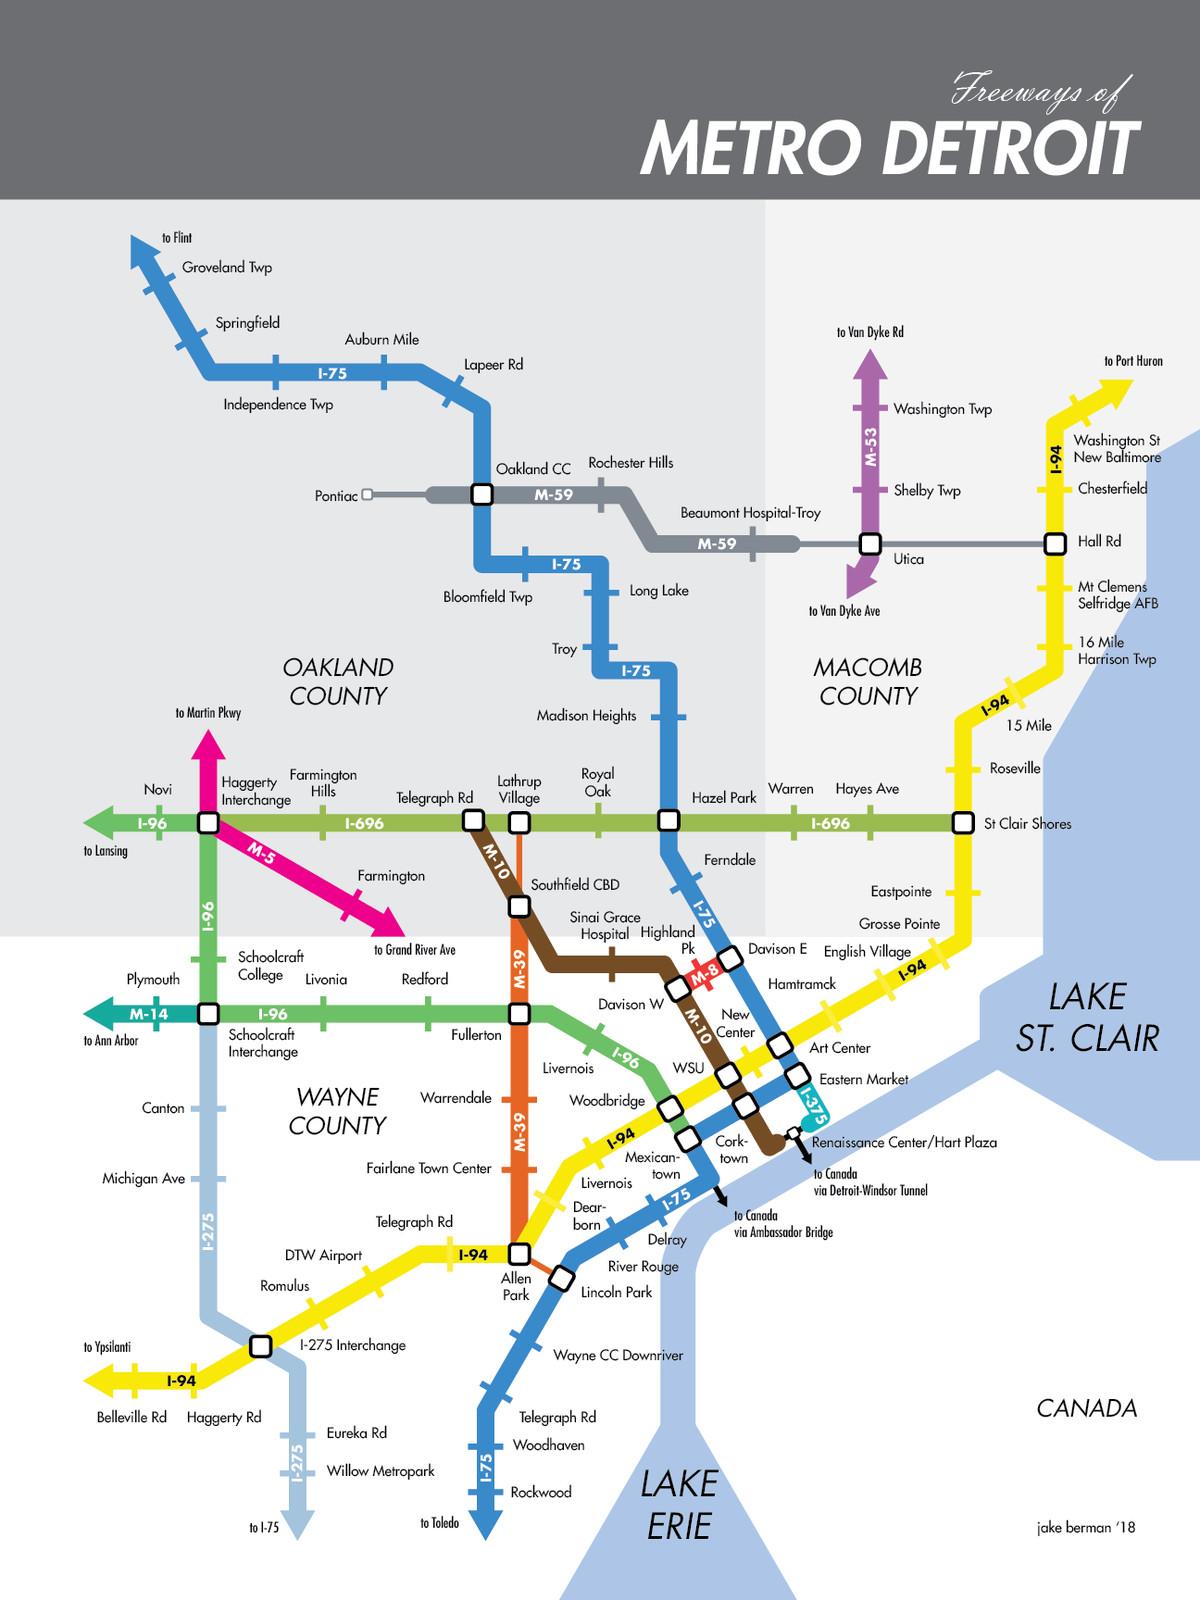 Subway Map Metro.This Map Reimagines Metro Detroit S Freeways As Subway Lines